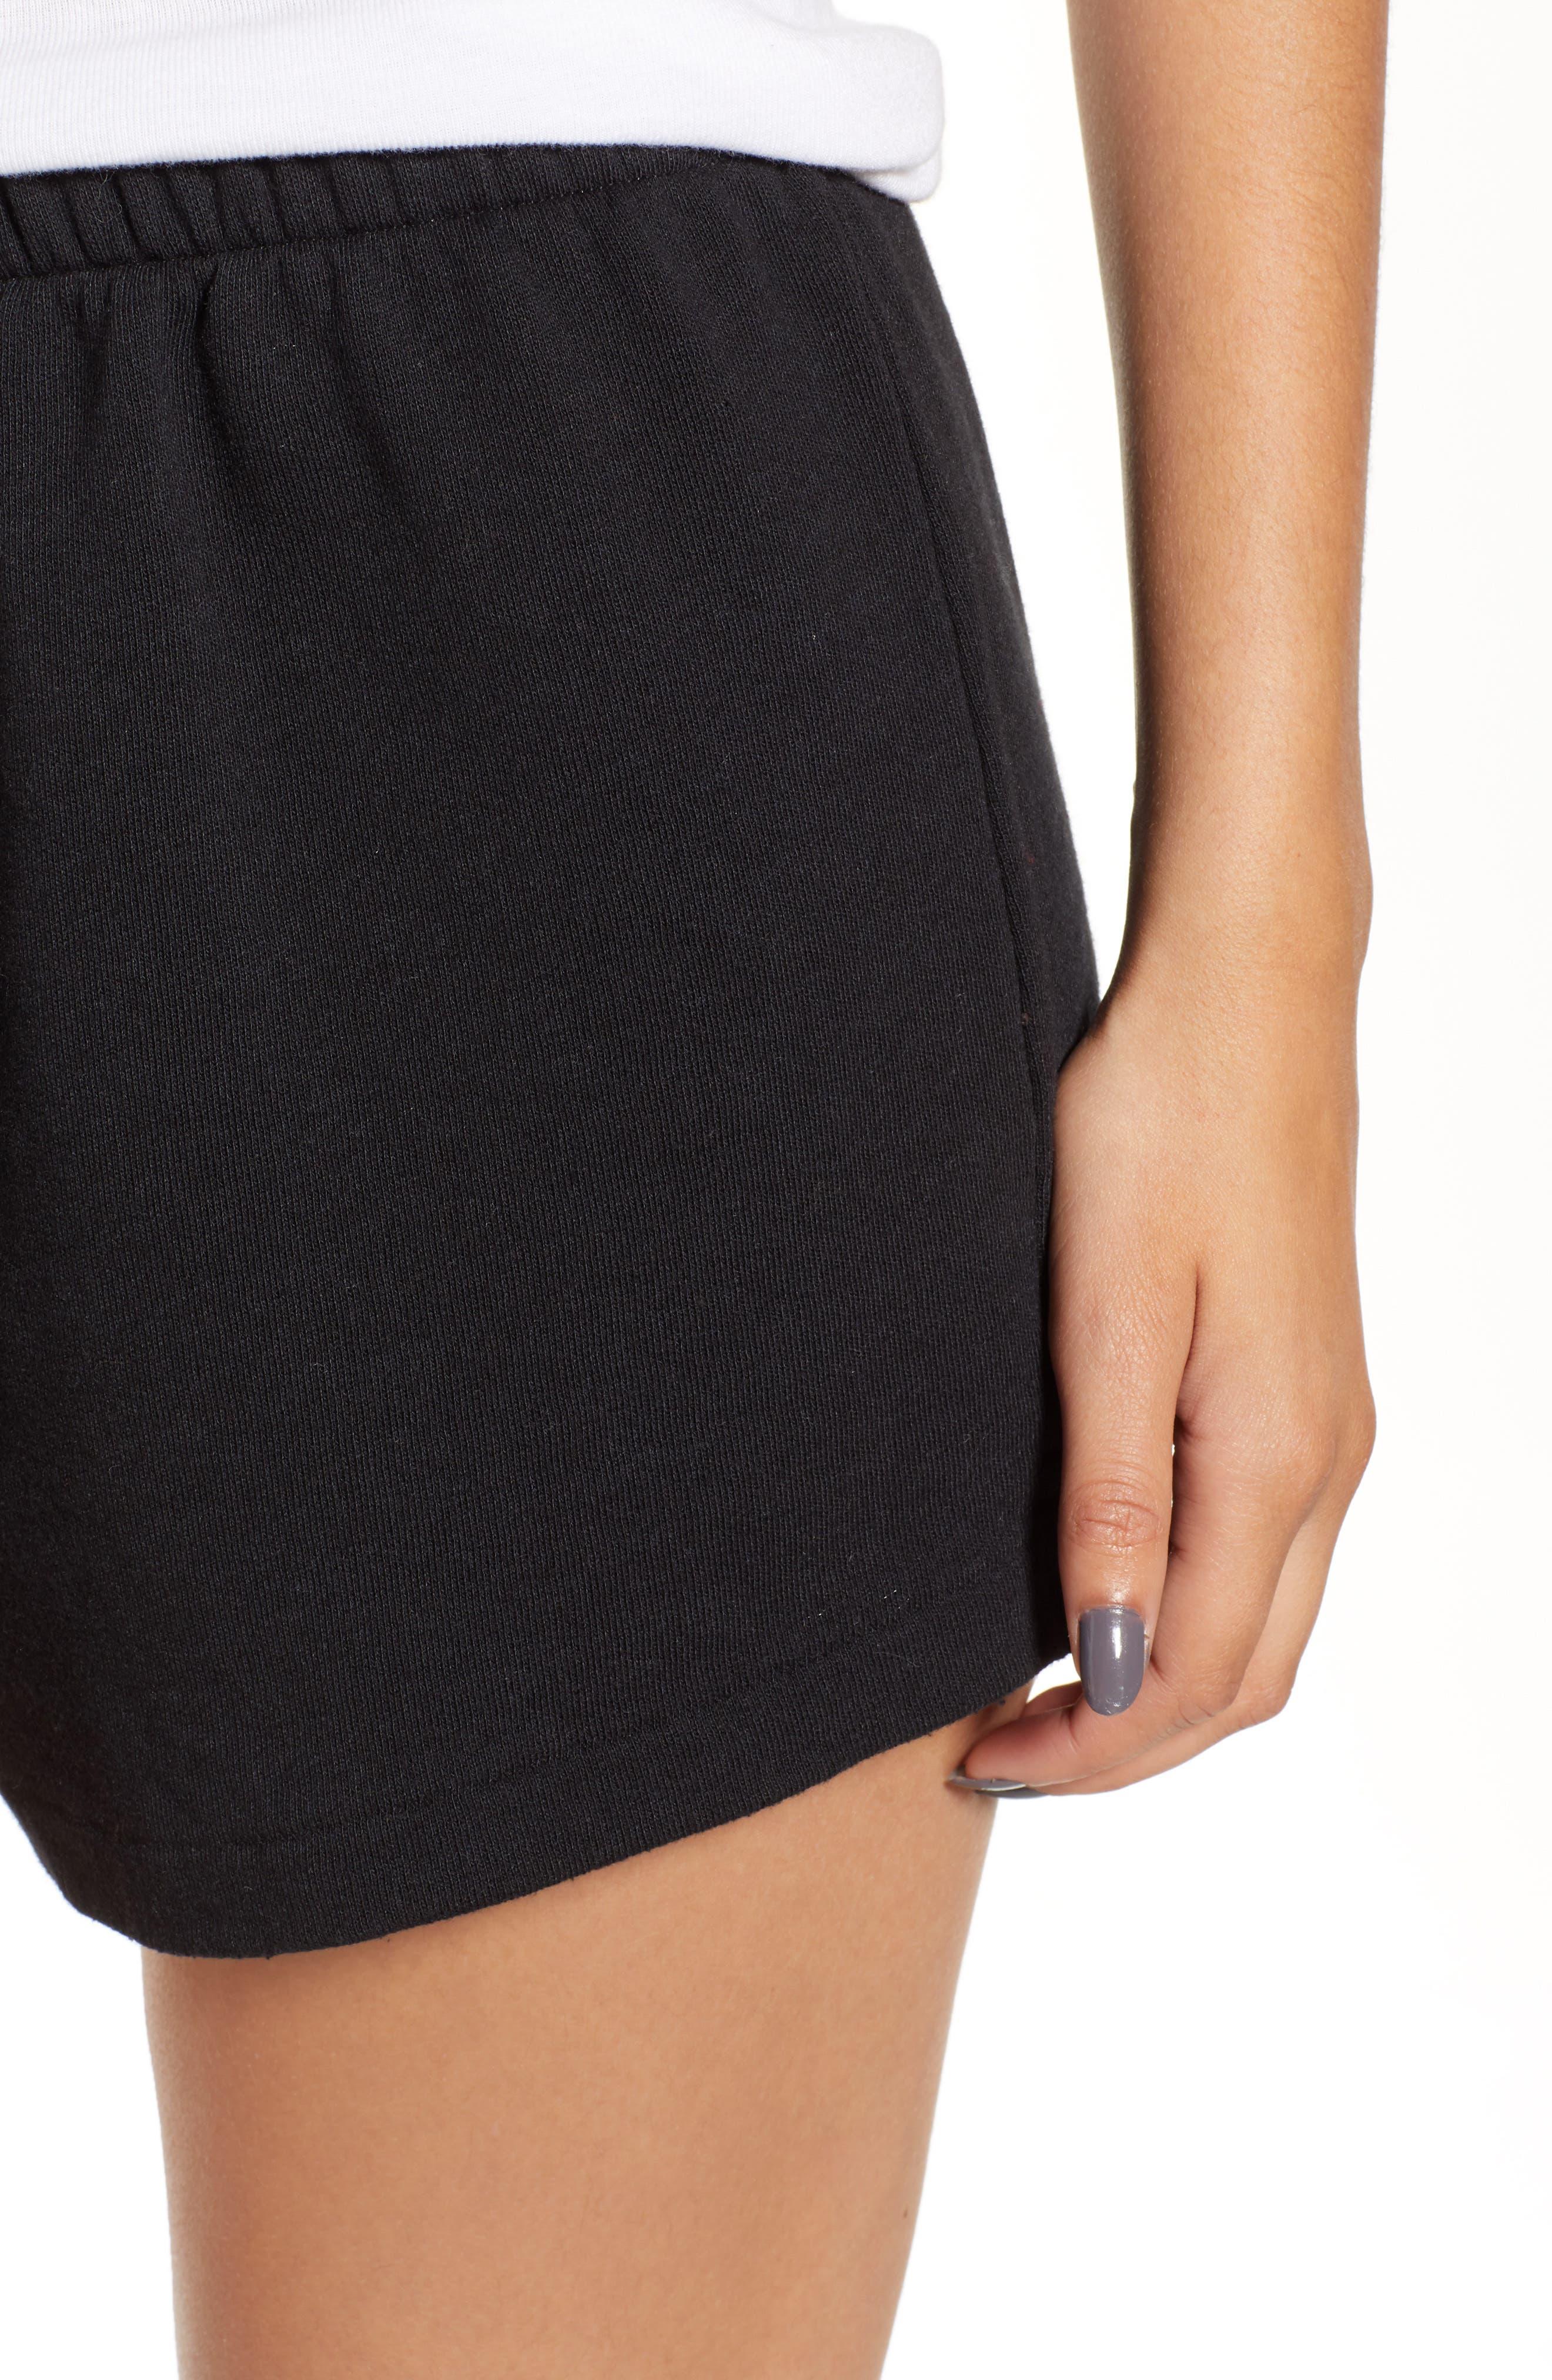 Golden Shorts,                             Alternate thumbnail 4, color,                             JET BLACK